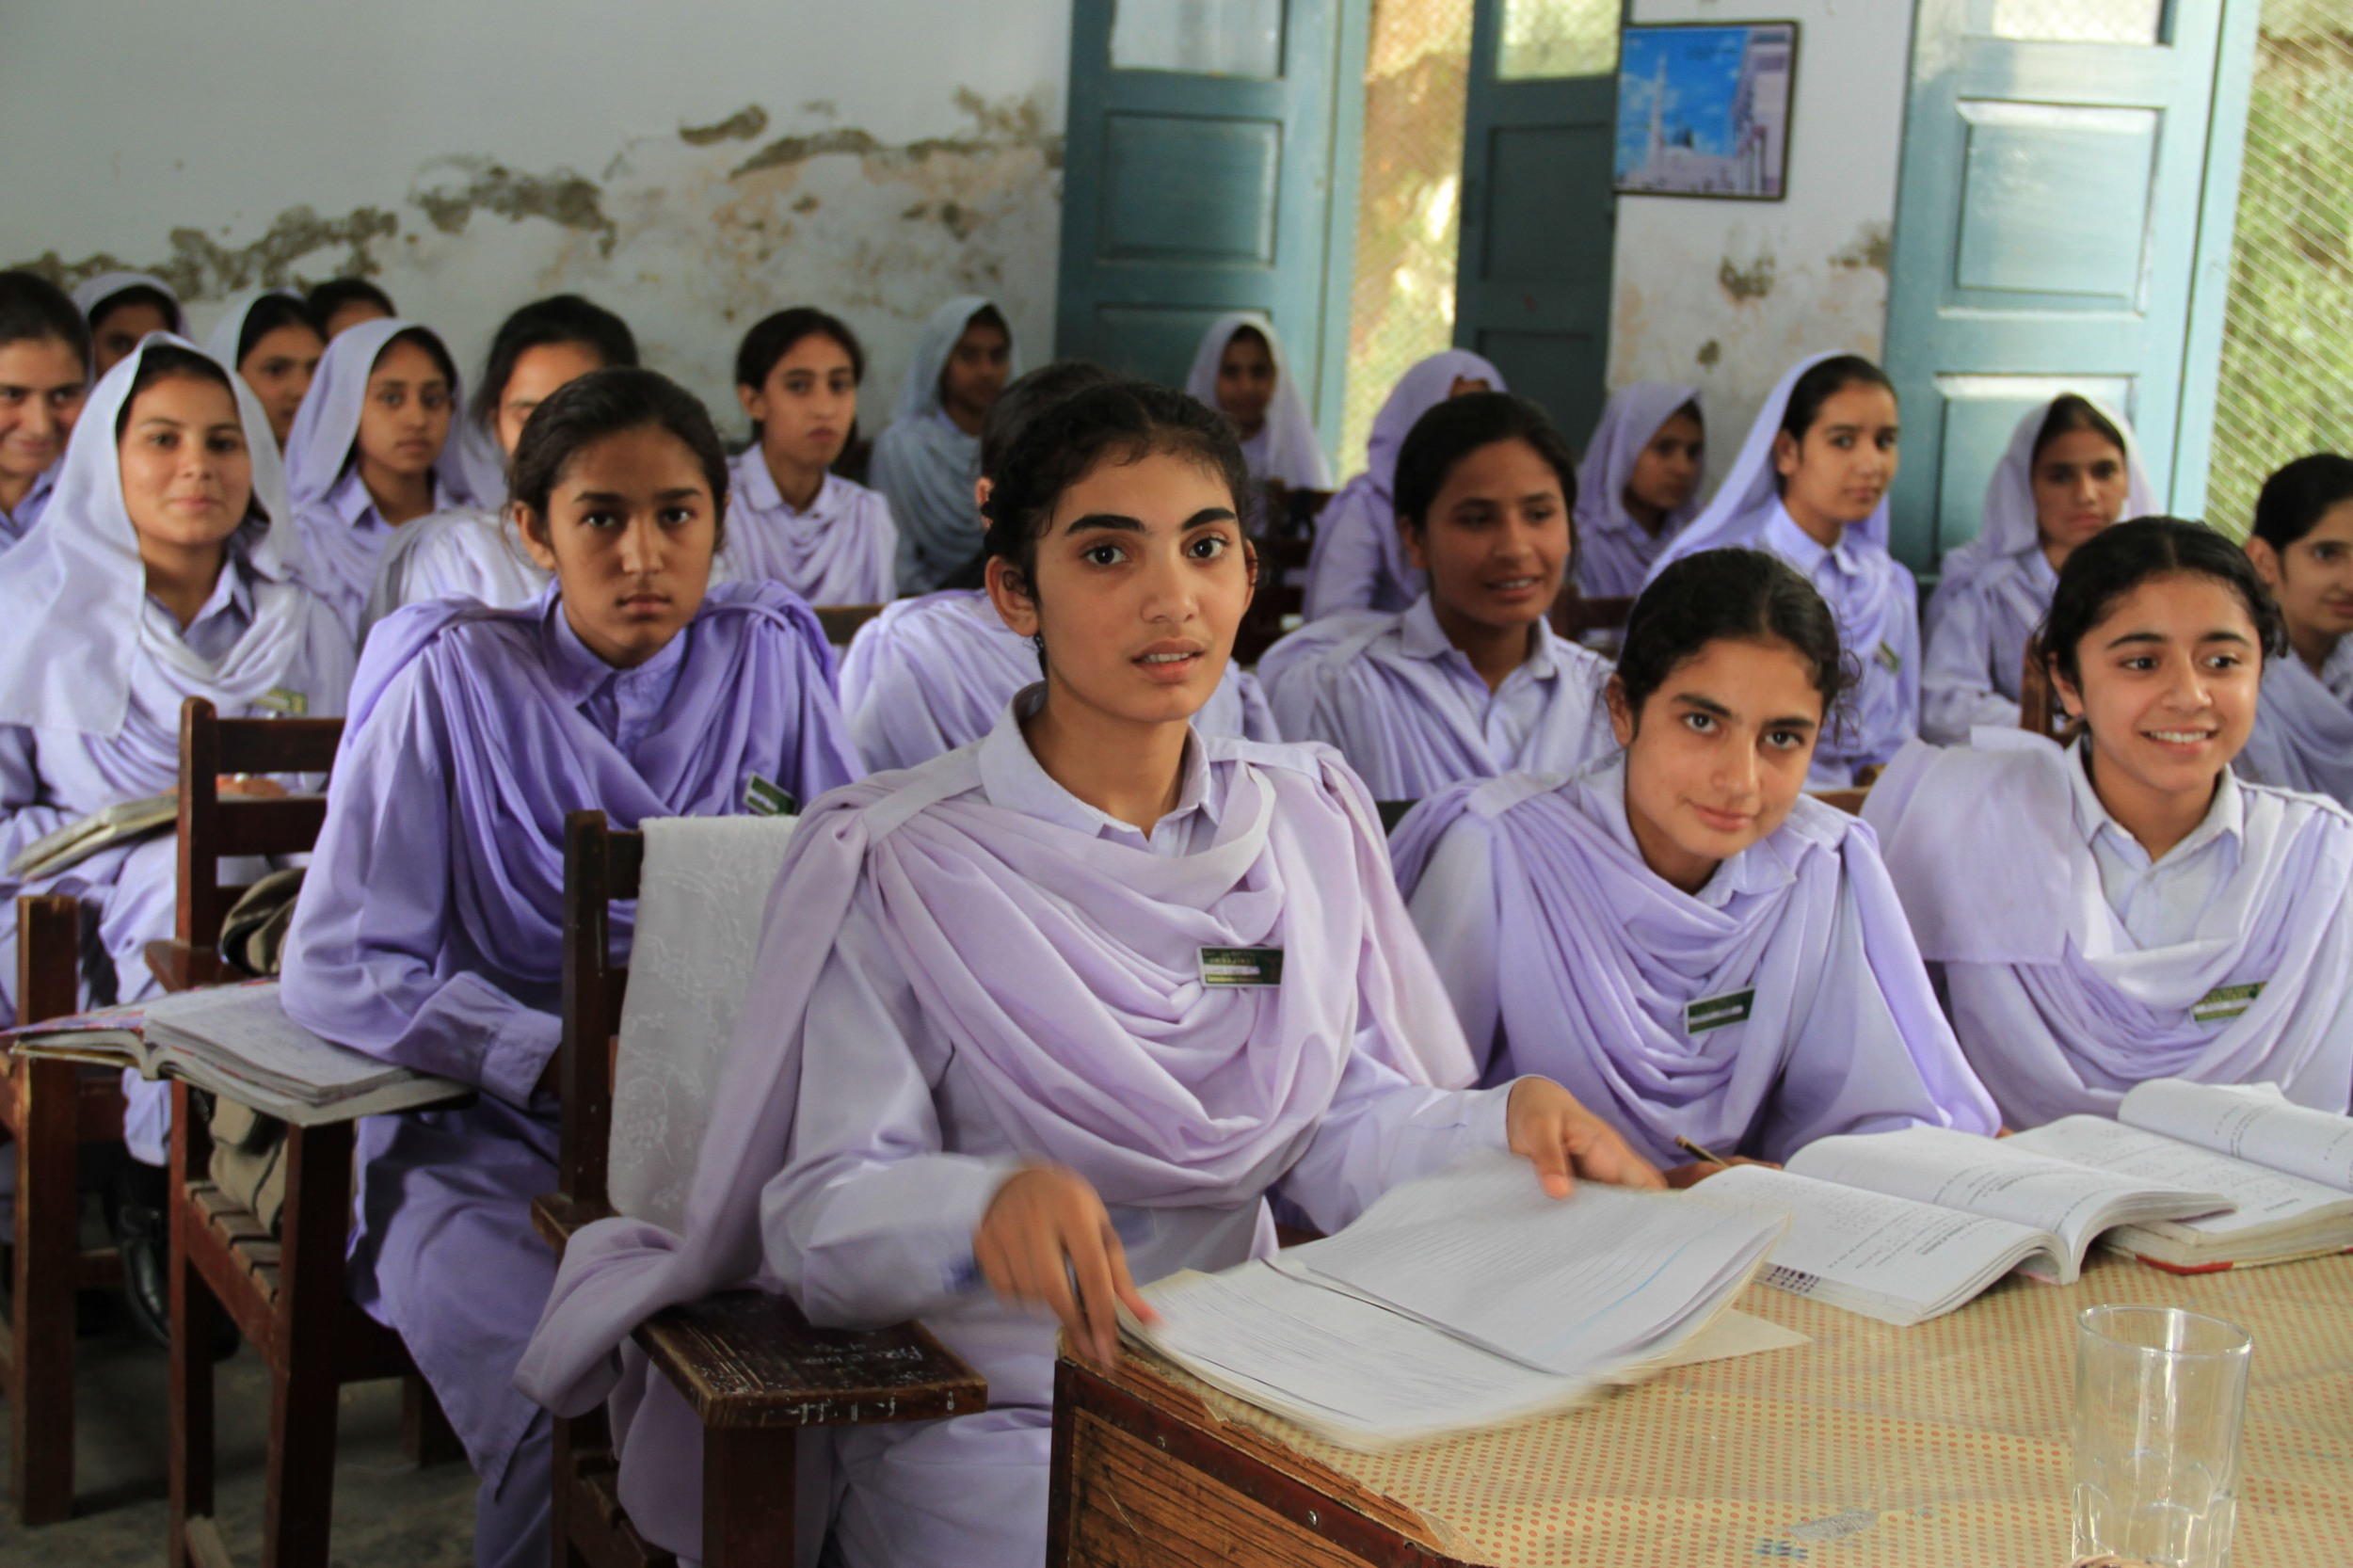 Women fight terror through education